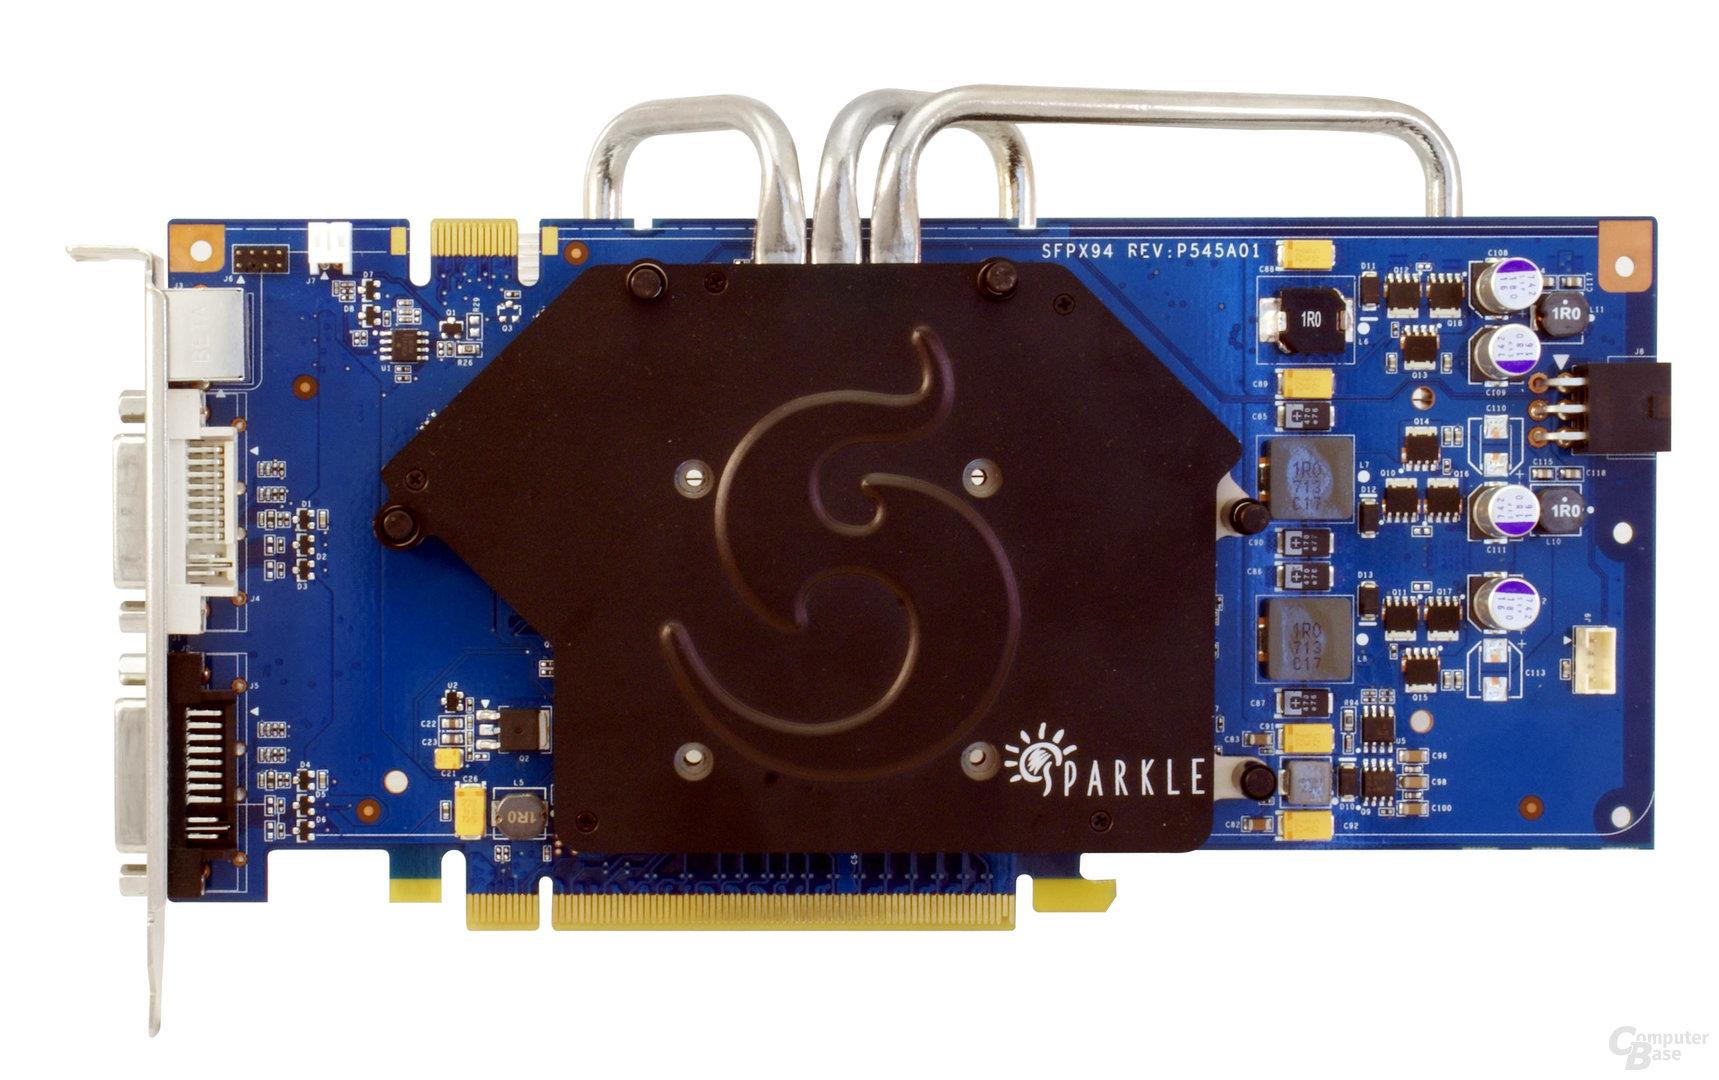 Sparkle GeForce 9600 GT Passiv